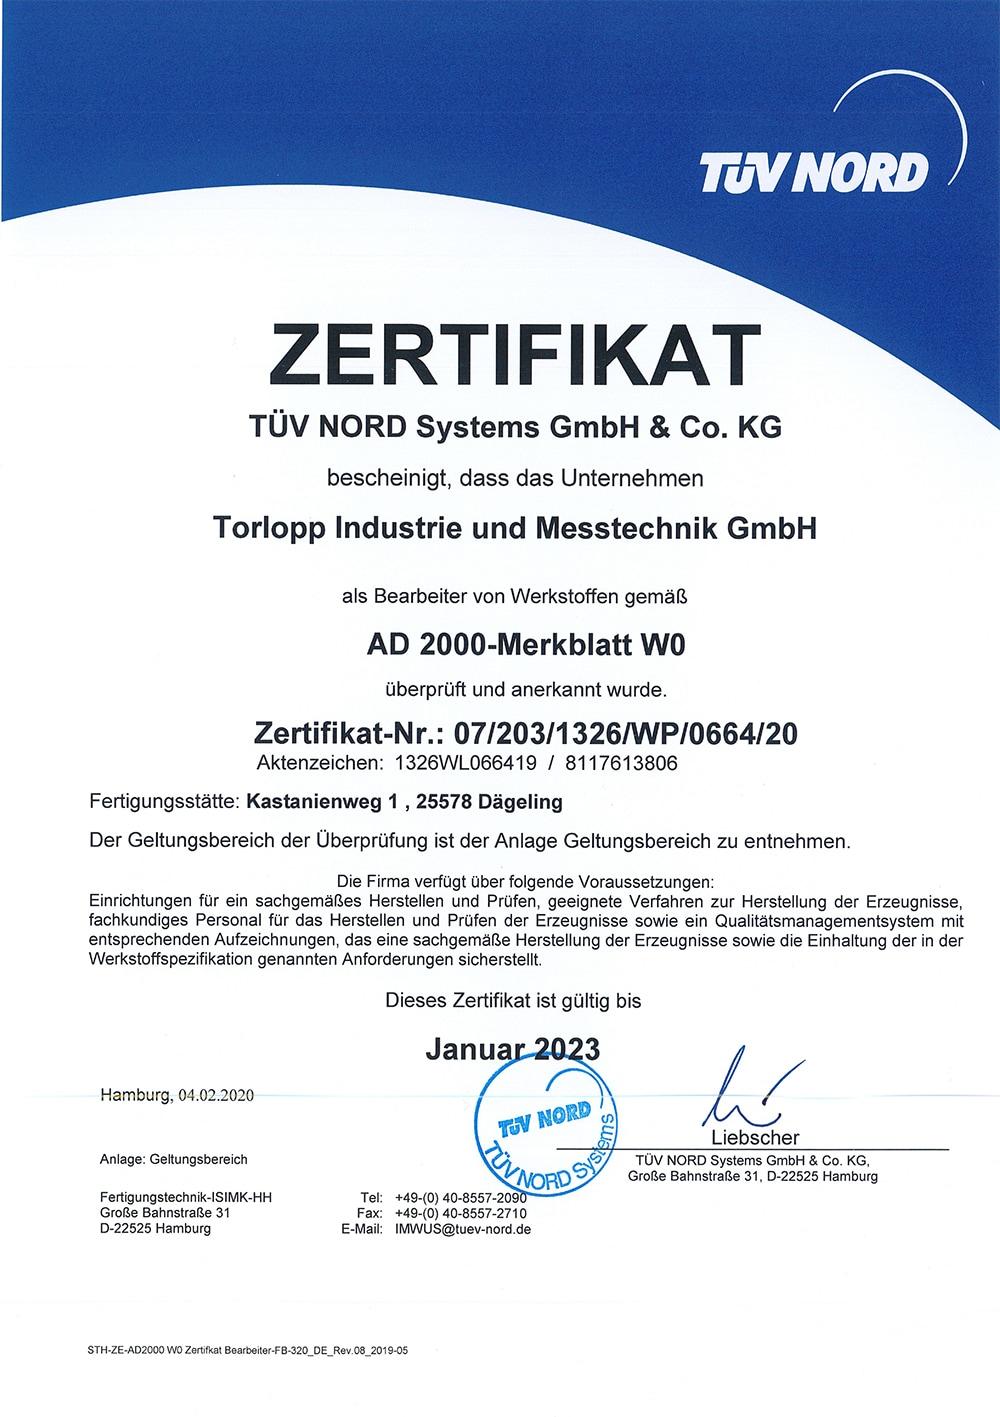 Zertifikat-AD-2000-Merkblatt-W0